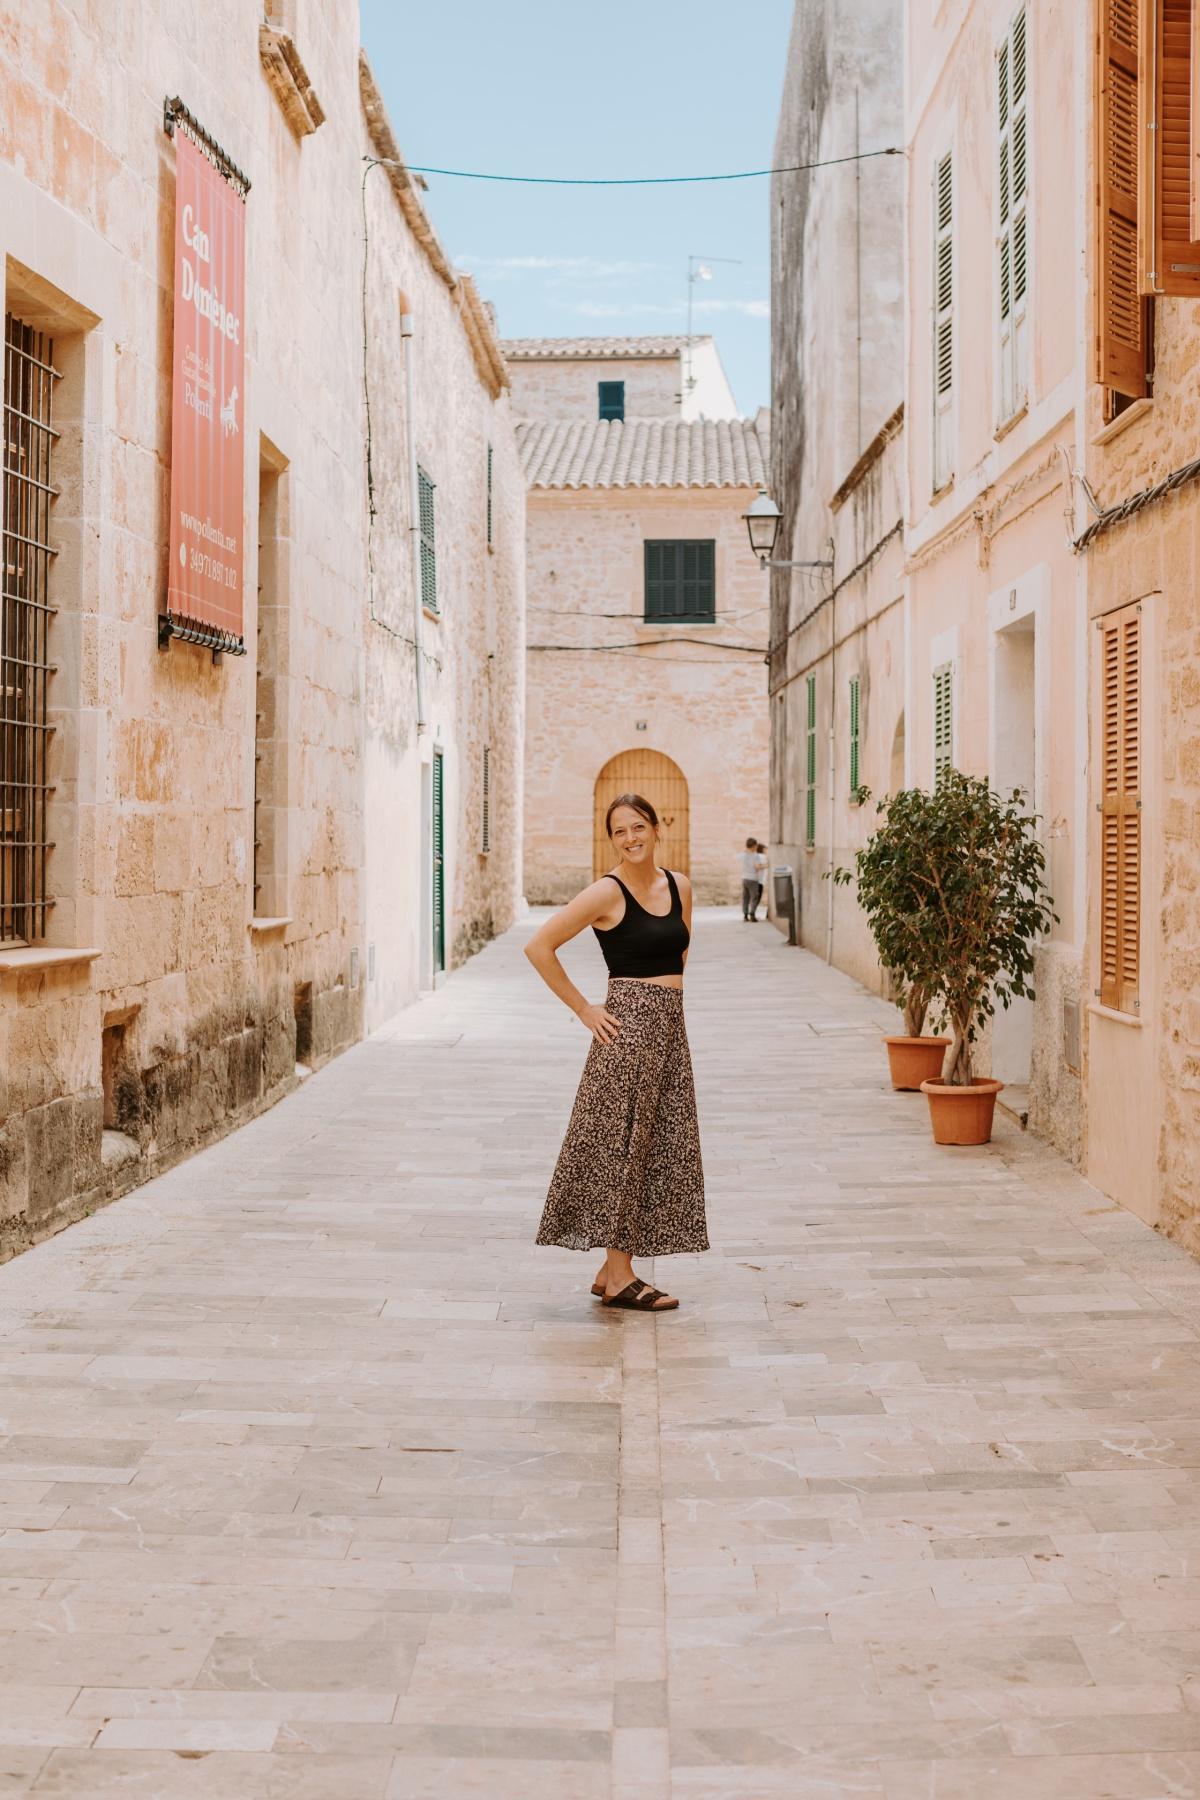 Taking photos in Alcudia Mallorca Spain